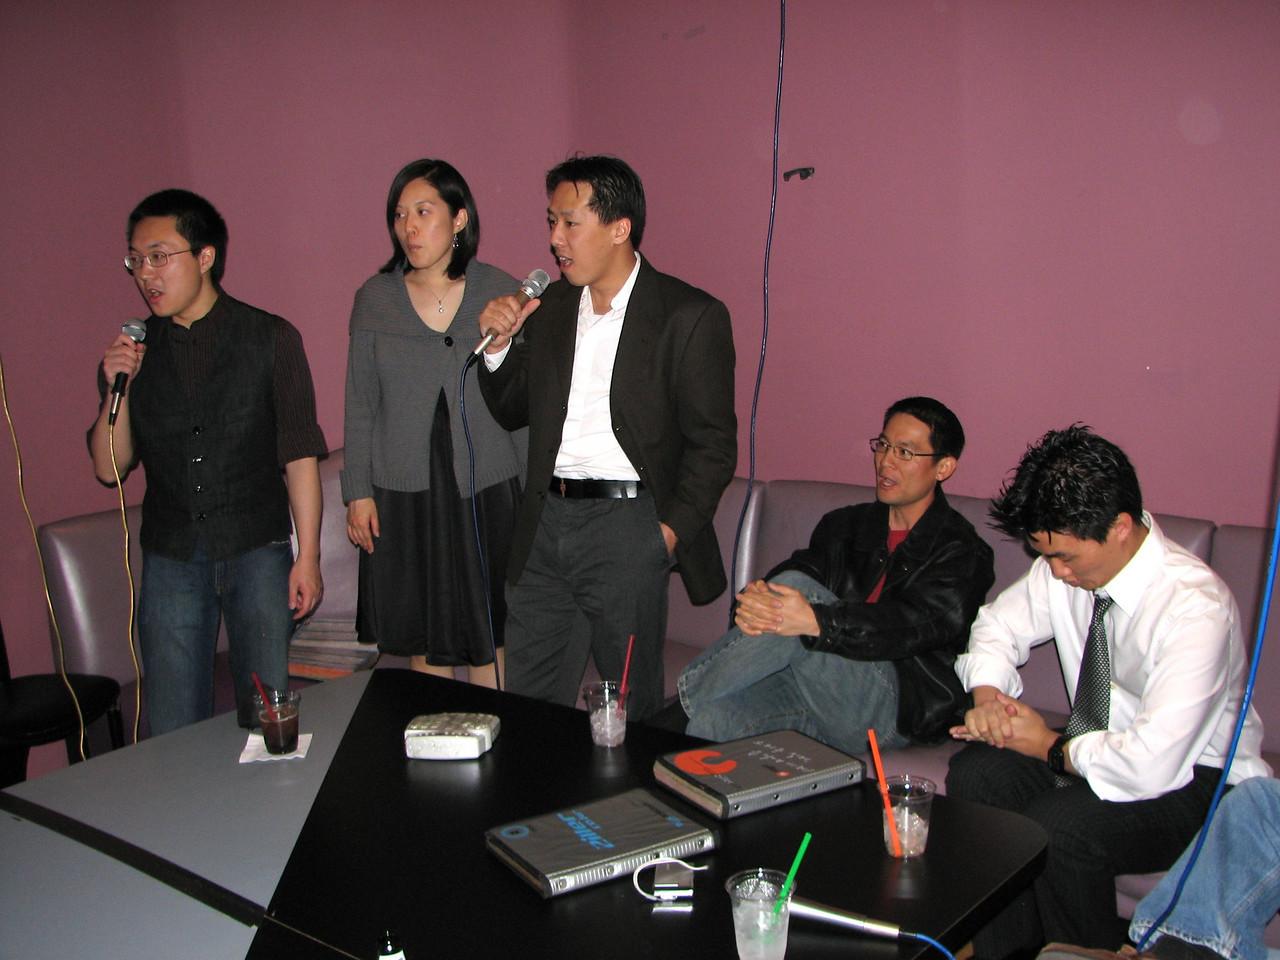 2008 03 15 Sat - Orchid - Caleb Yang, Sojin Kim, Larry Lee, Tony, & friend karaokeing